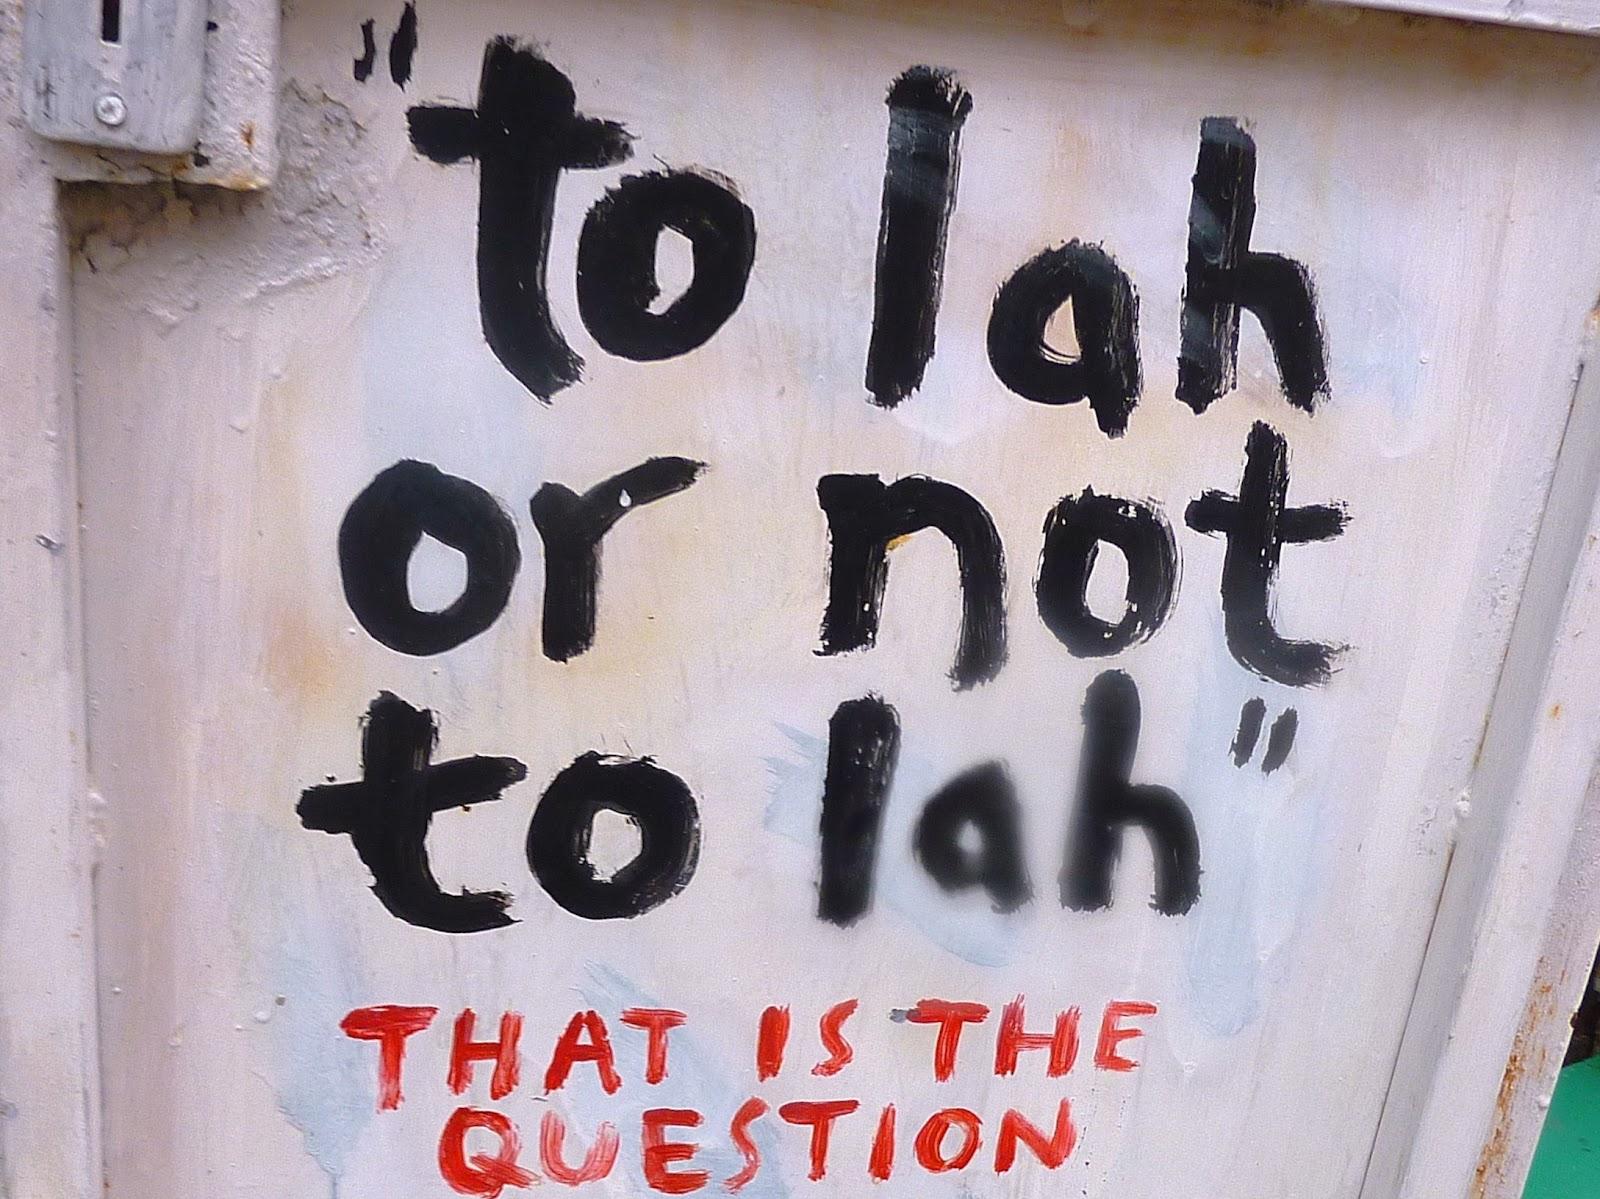 http://4.bp.blogspot.com/-pSA7AJp0dWg/UERZJzOMqRI/AAAAAAAABzE/dgkZ_7z_y7c/s1600/too+lah+or+not+too+lah.jpg